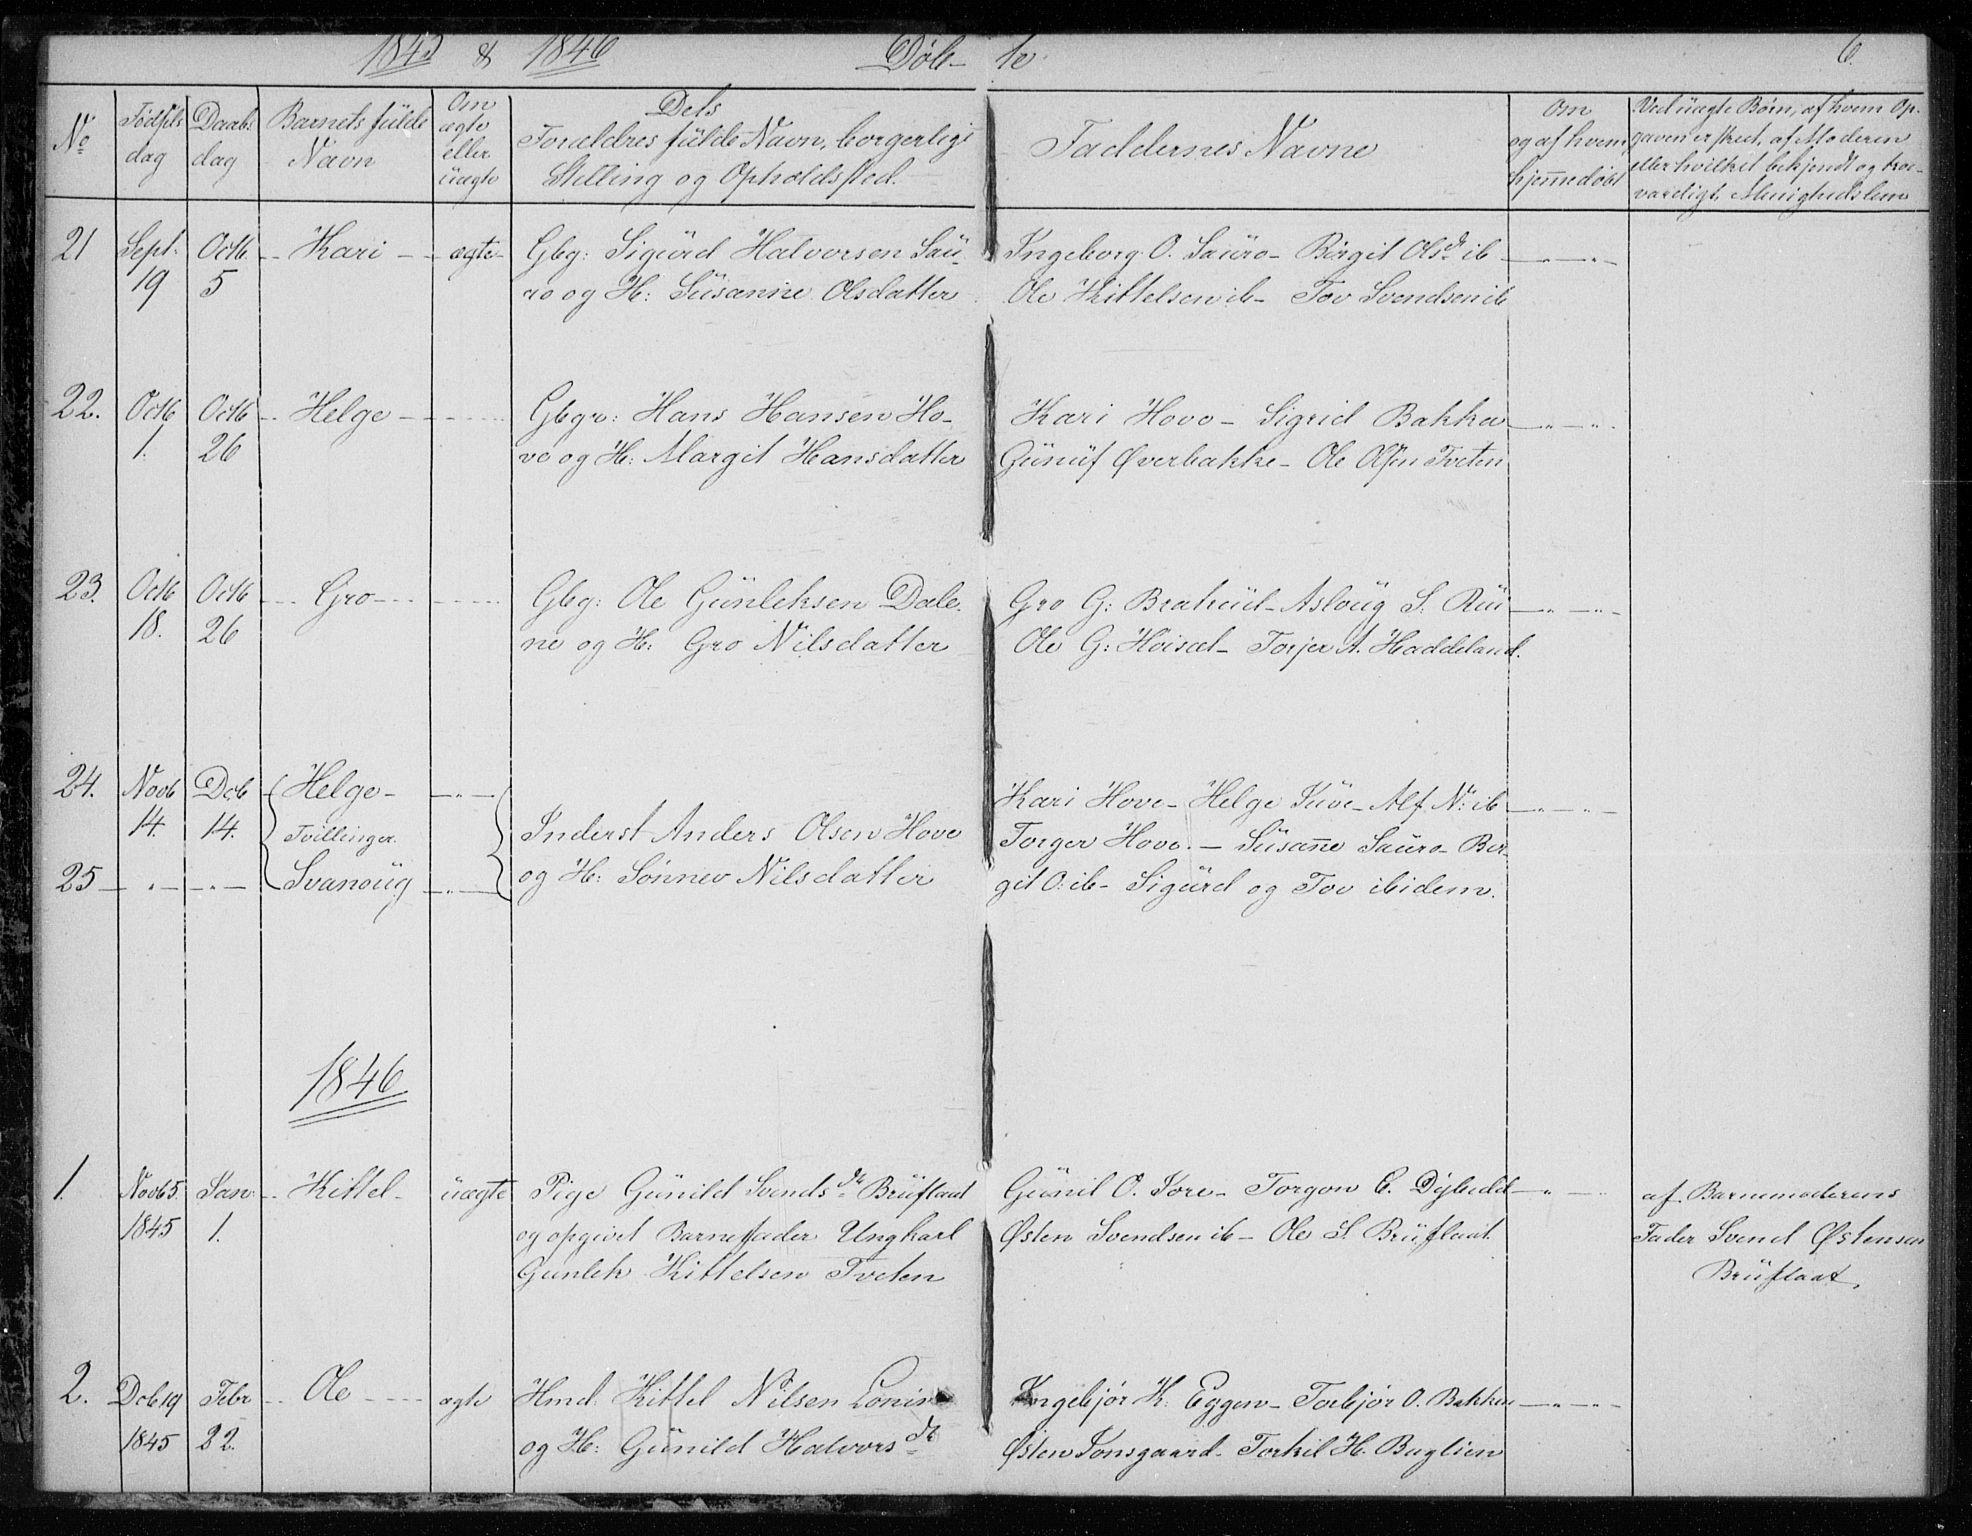 SAKO, Gransherad kirkebøker, F/Fb/L0003: Ministerialbok nr. II 3, 1844-1859, s. 6